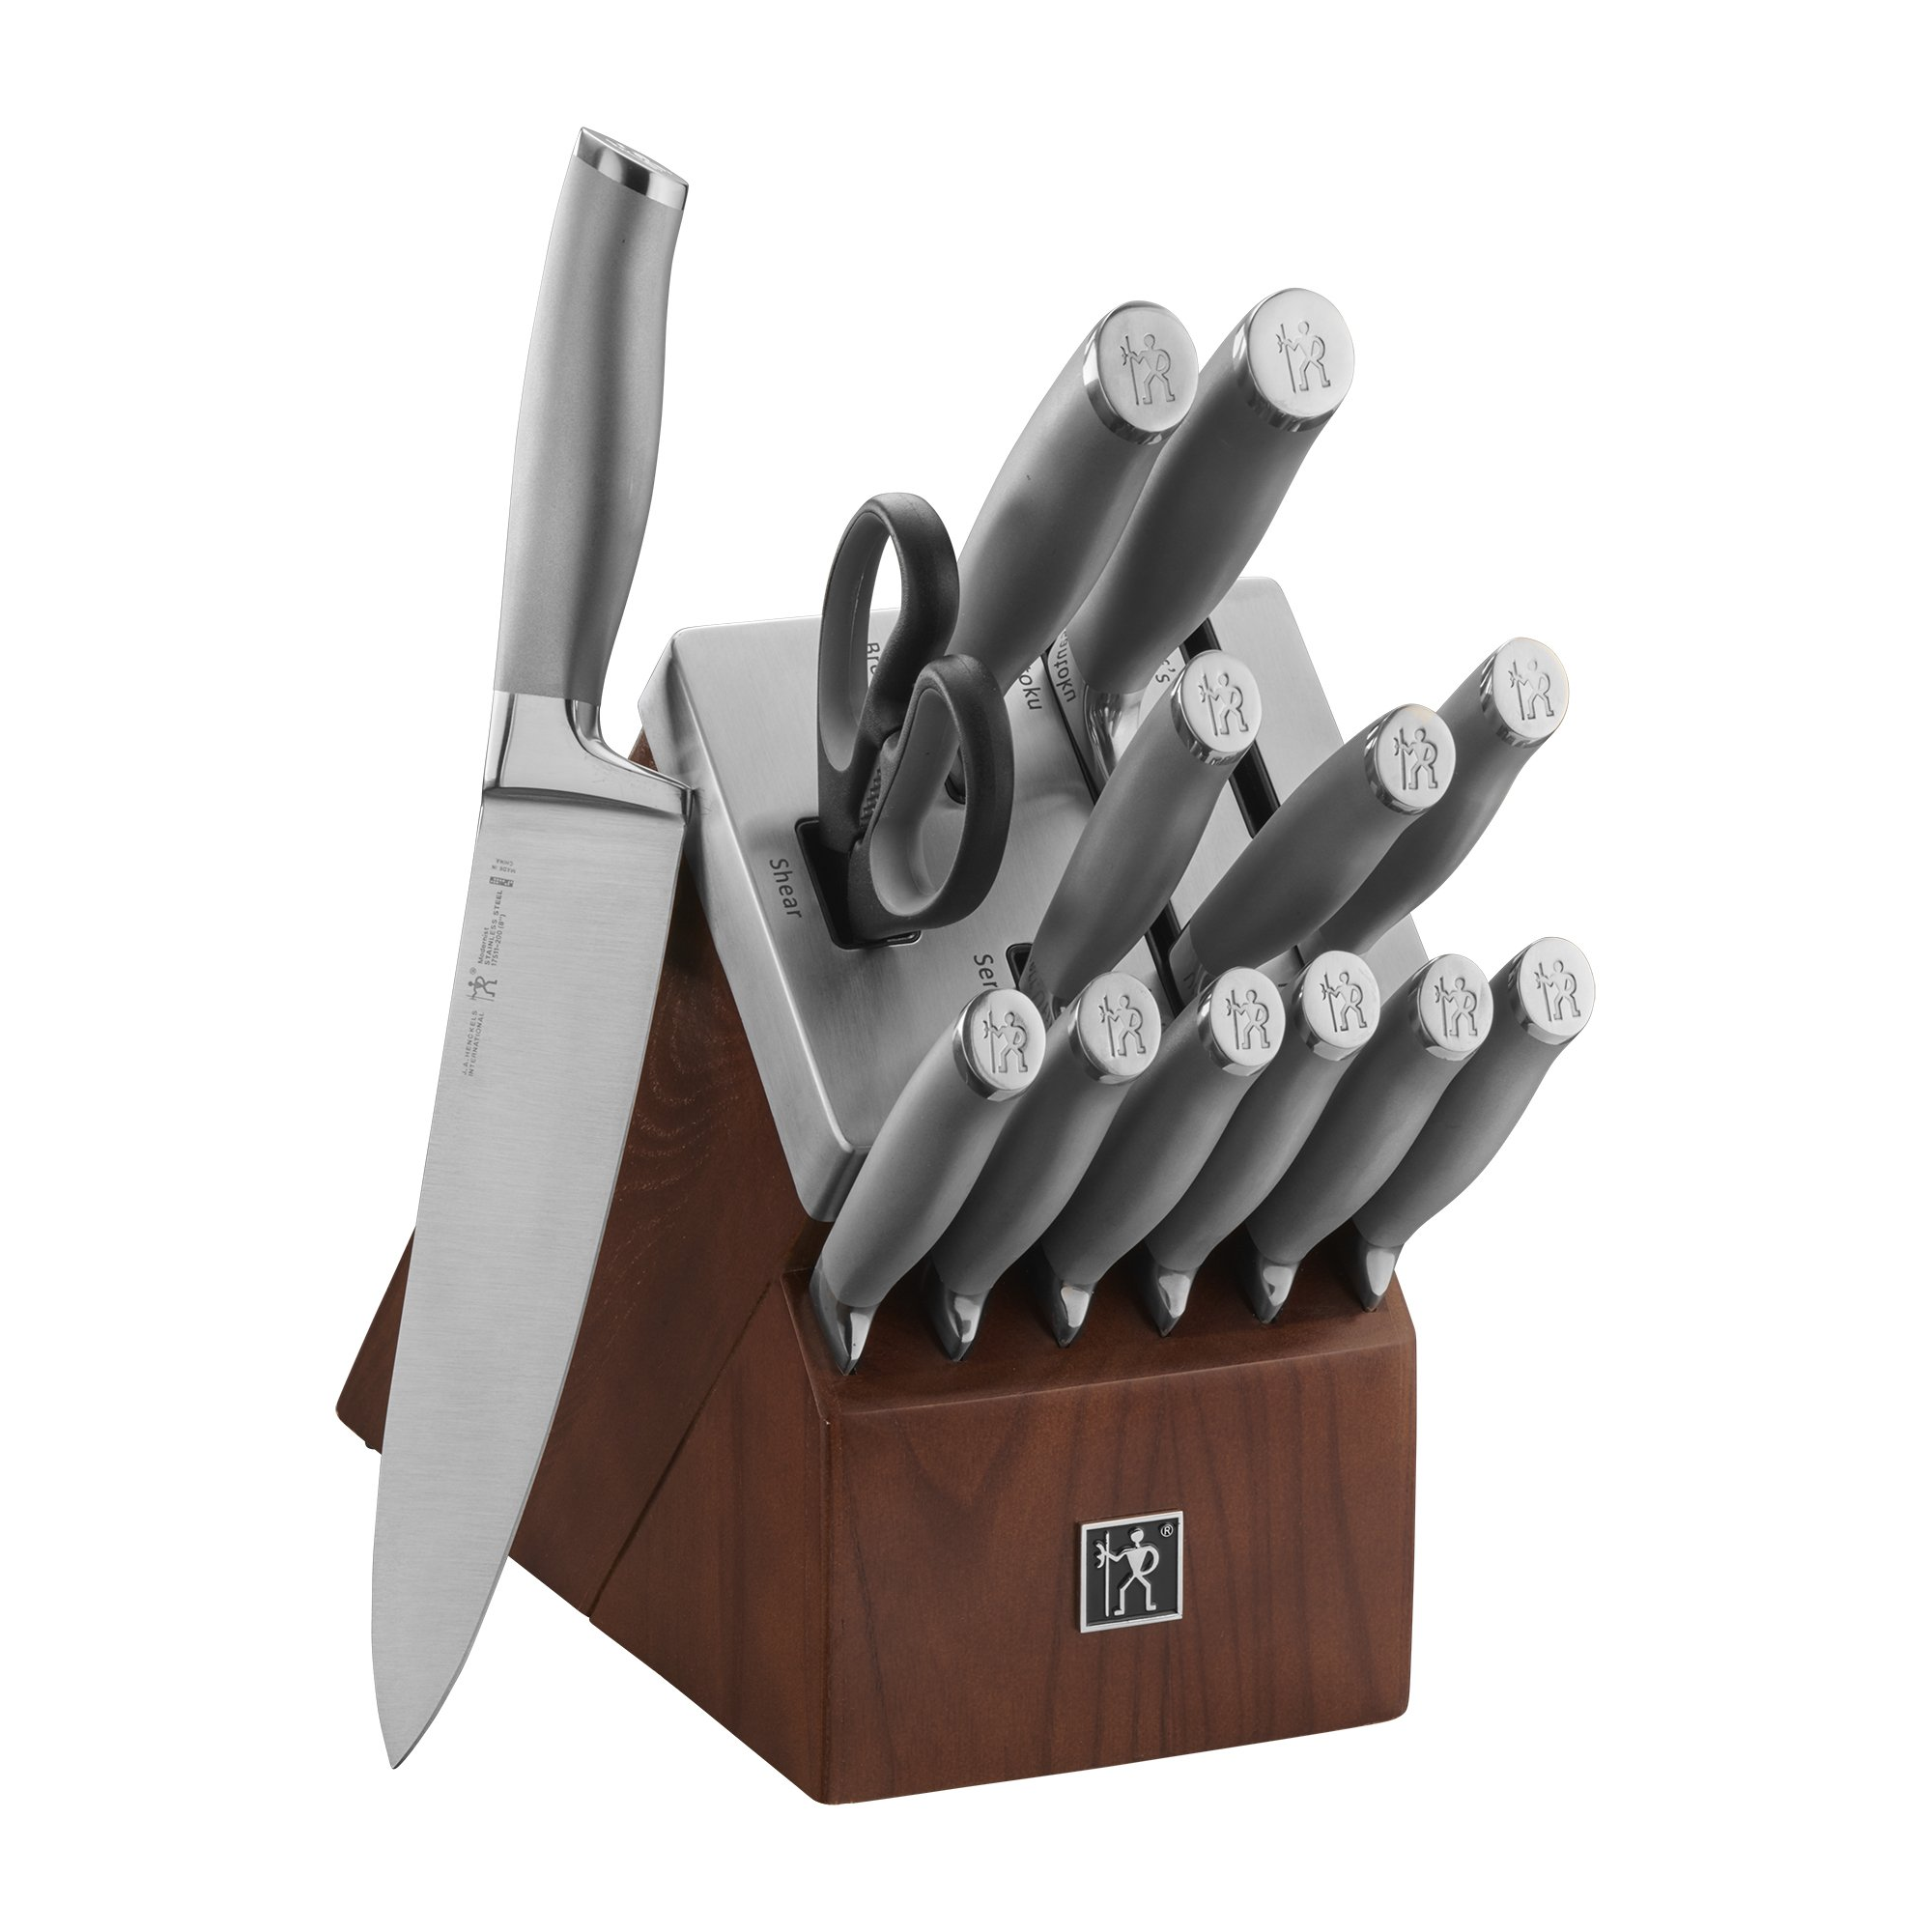 J.A. Henckels International Modernist 14-pc Self-Sharpening Block Set by ZWILLING J.A. Henckels